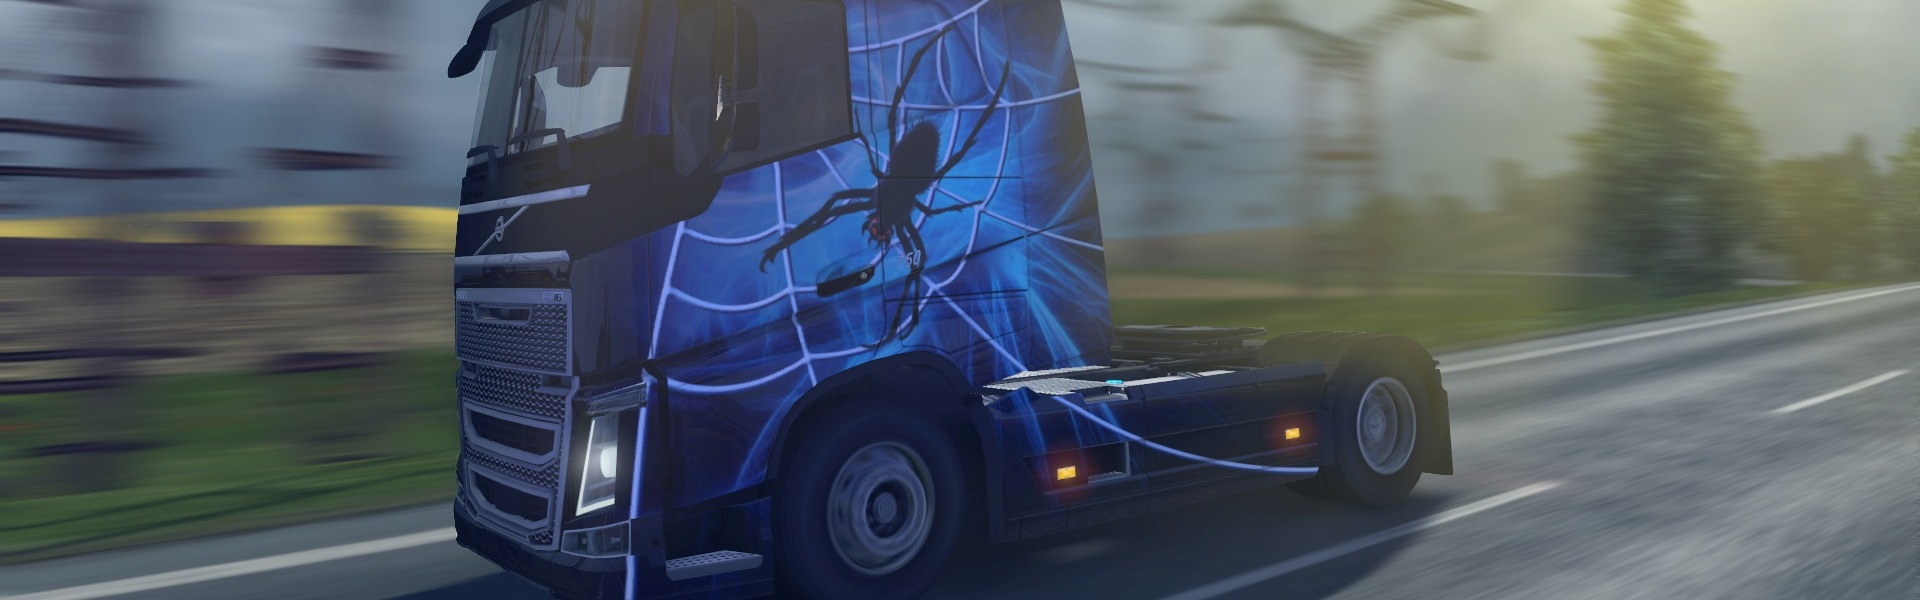 Euro Truck Simulator 2 - Halloween Paint Jobs Pack (DLC) Steam Key GLOBAL